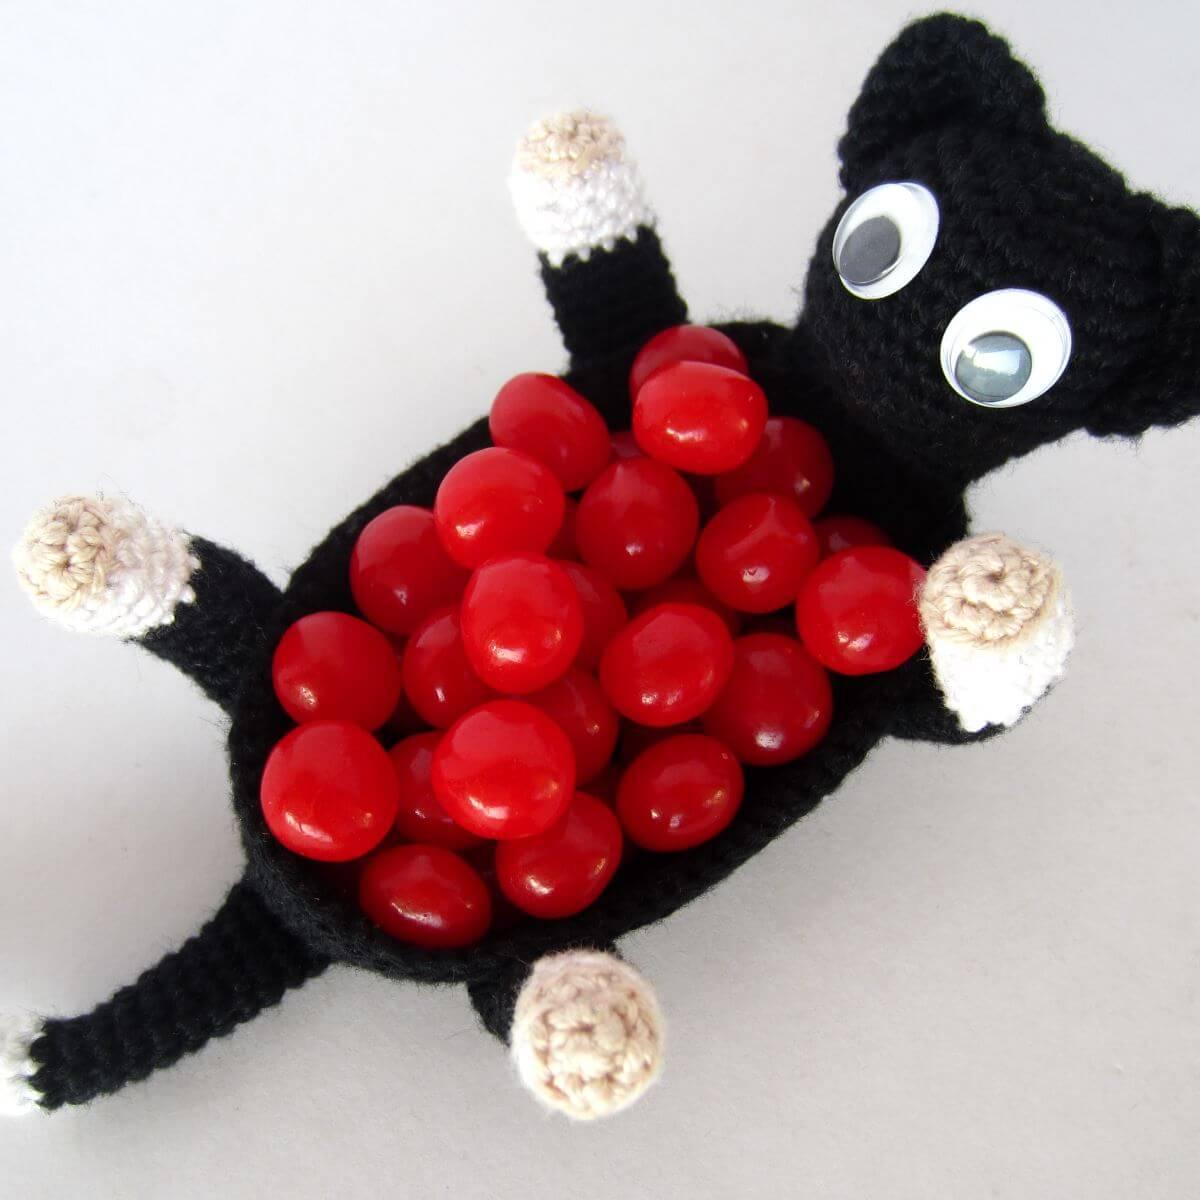 Amigurumi Nibble Cat Basket Featured Image